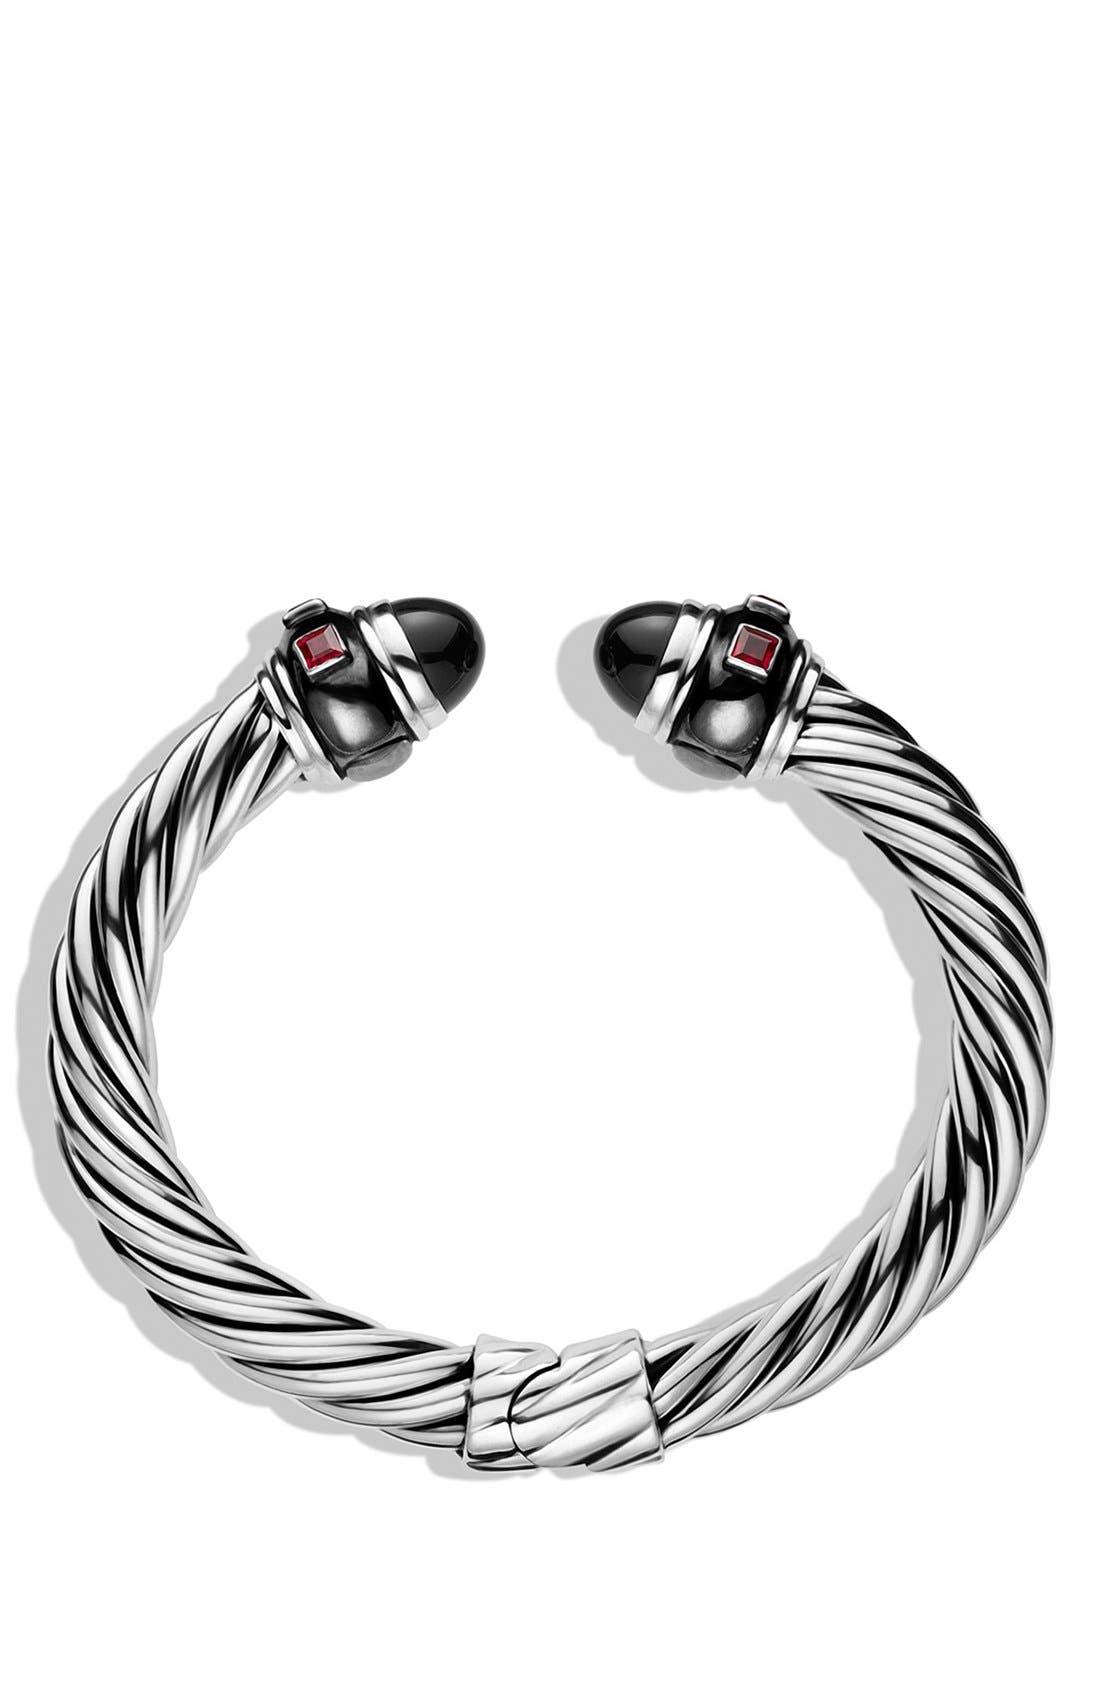 Alternate Image 2  - David Yurman 'Renaissance' Bracelet with Black Onyx and Ruby